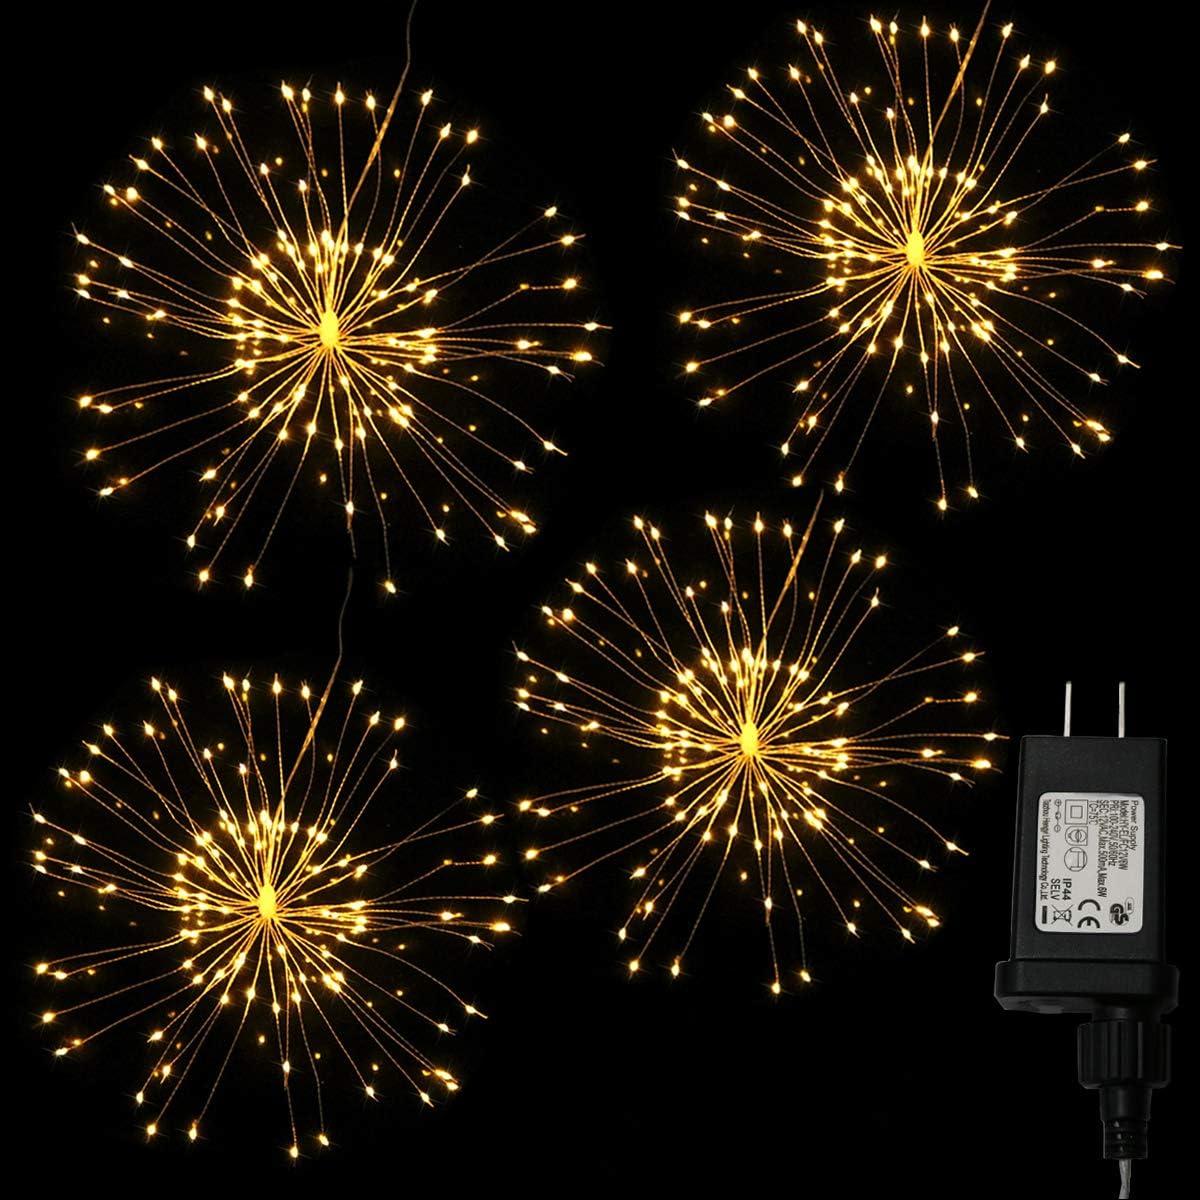 Max 40% OFF Dreamworth 4 Pcs Total 480 LED Wire Copper Firework Superlatite Fair Lights